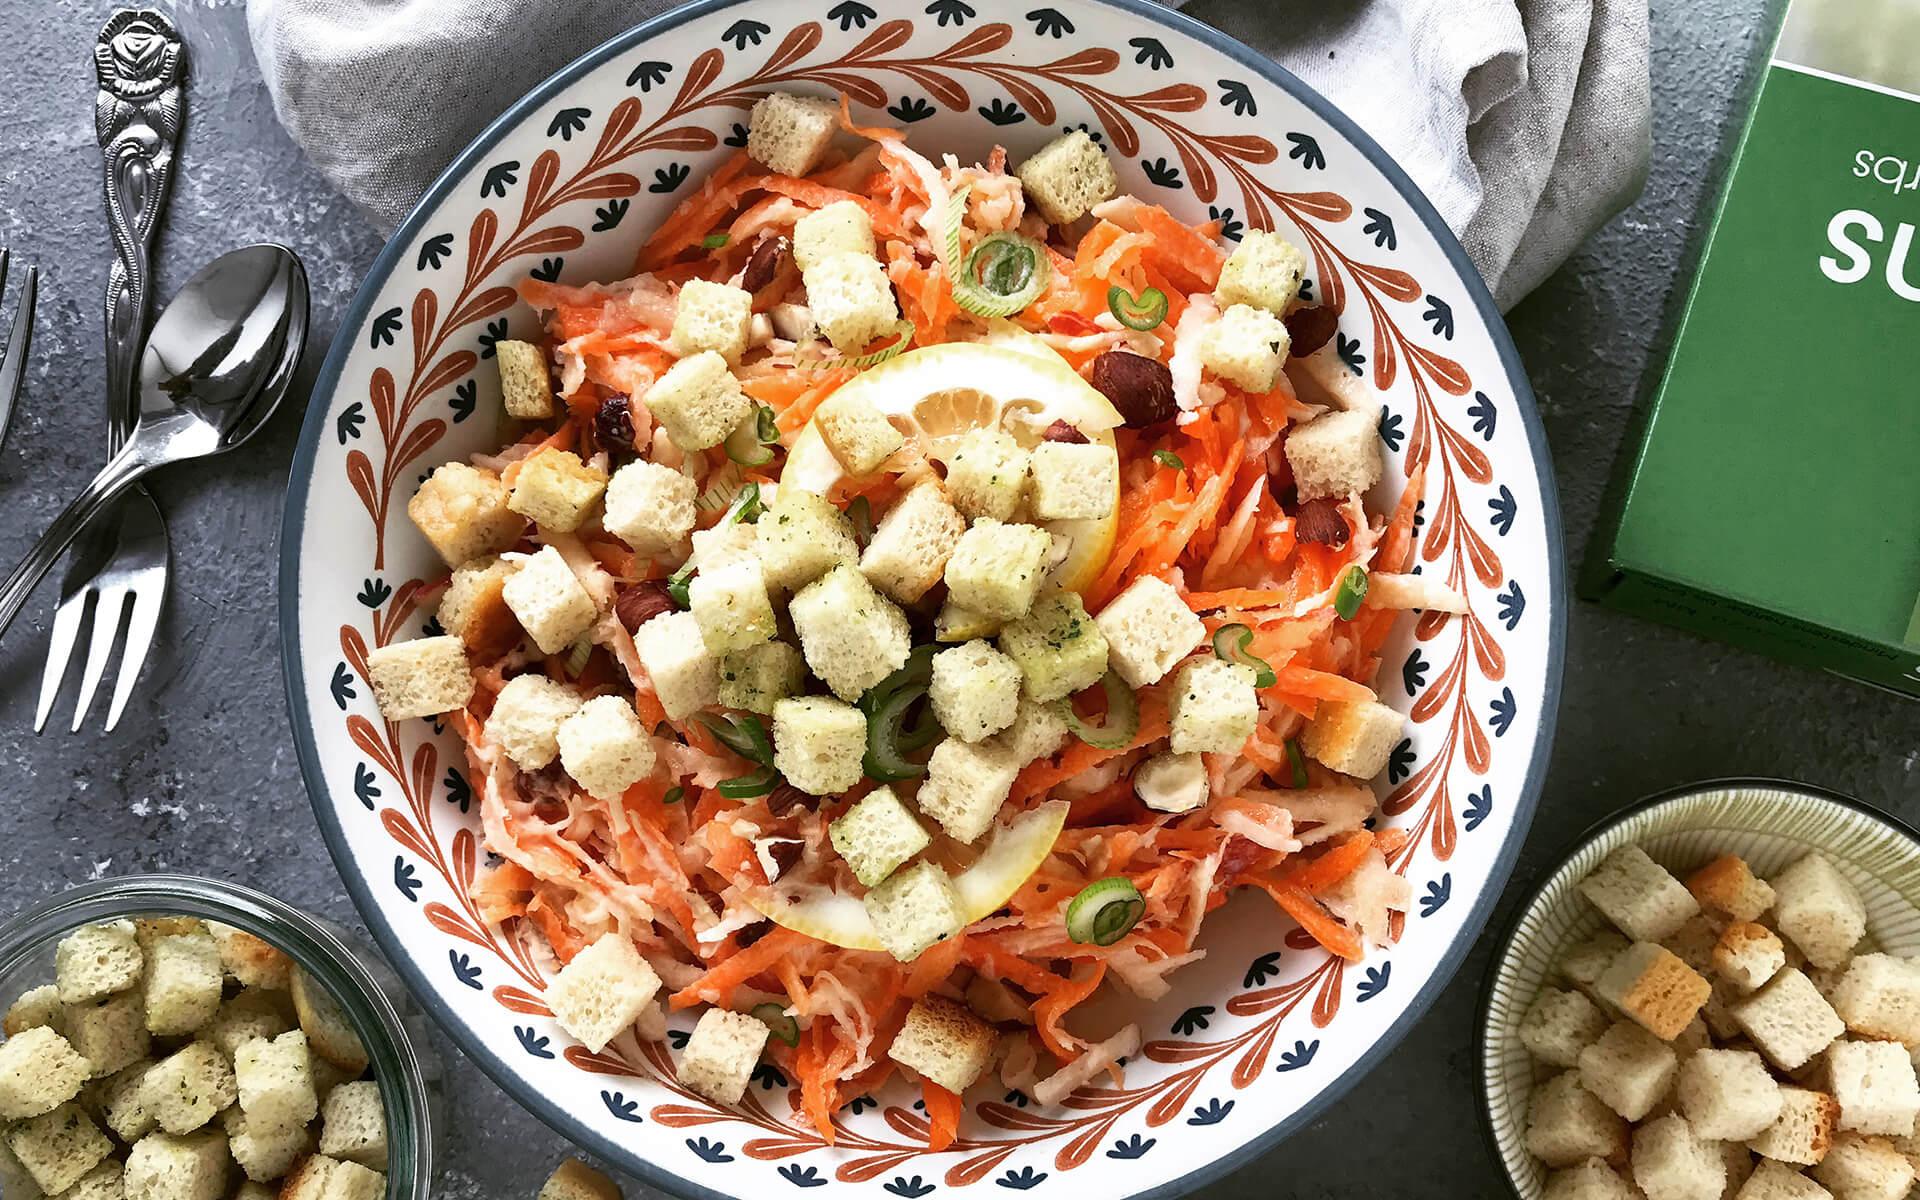 Karotten-Sellerie-Salat mit knusprigen Croutons